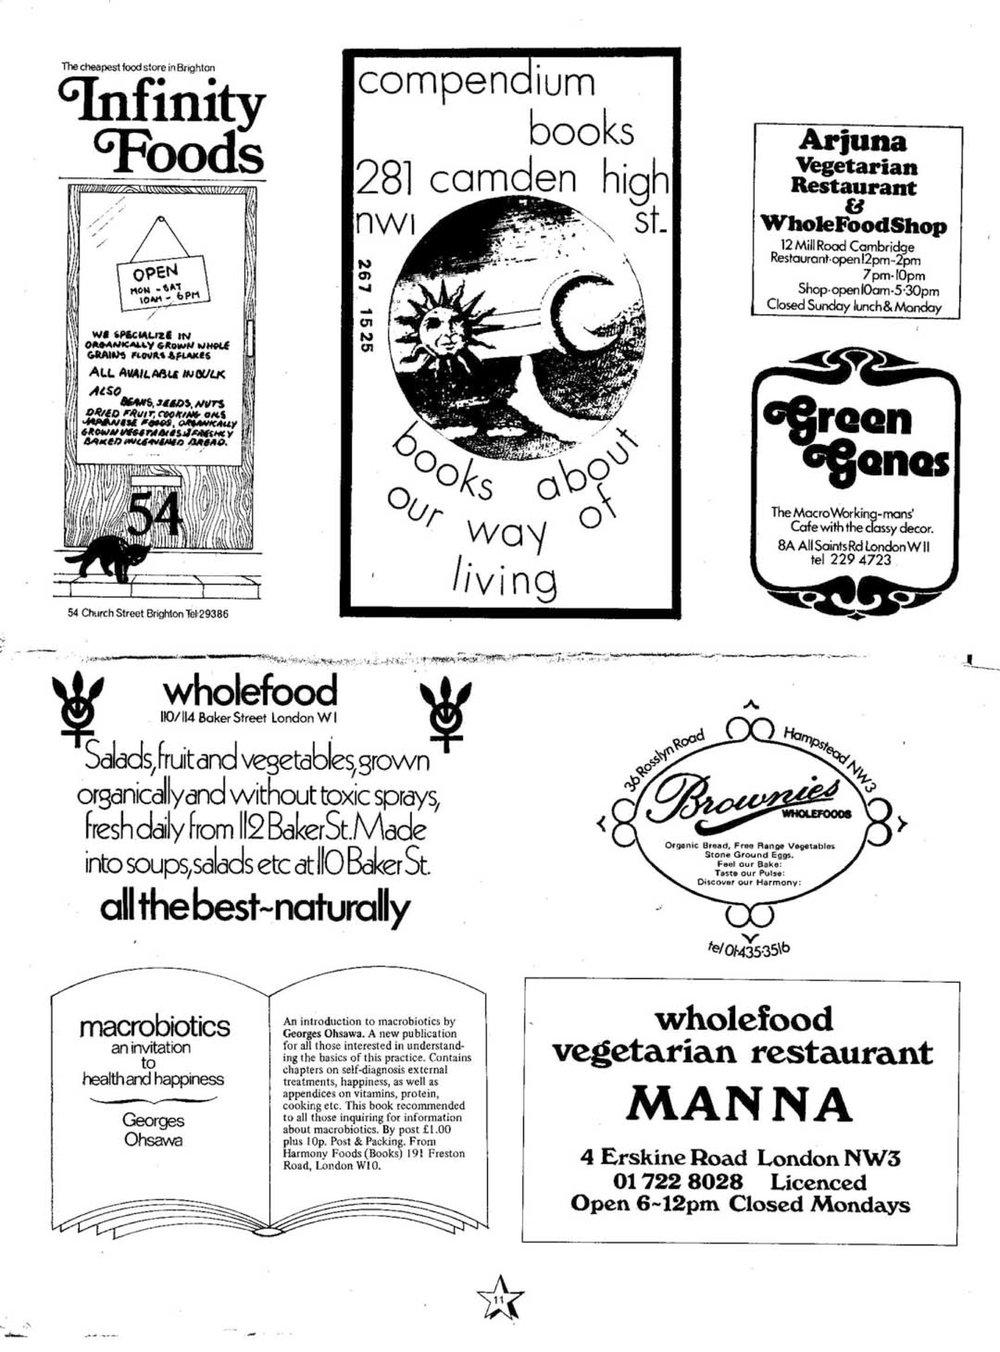 seed-v1-n1-nov1971 p.11.jpg